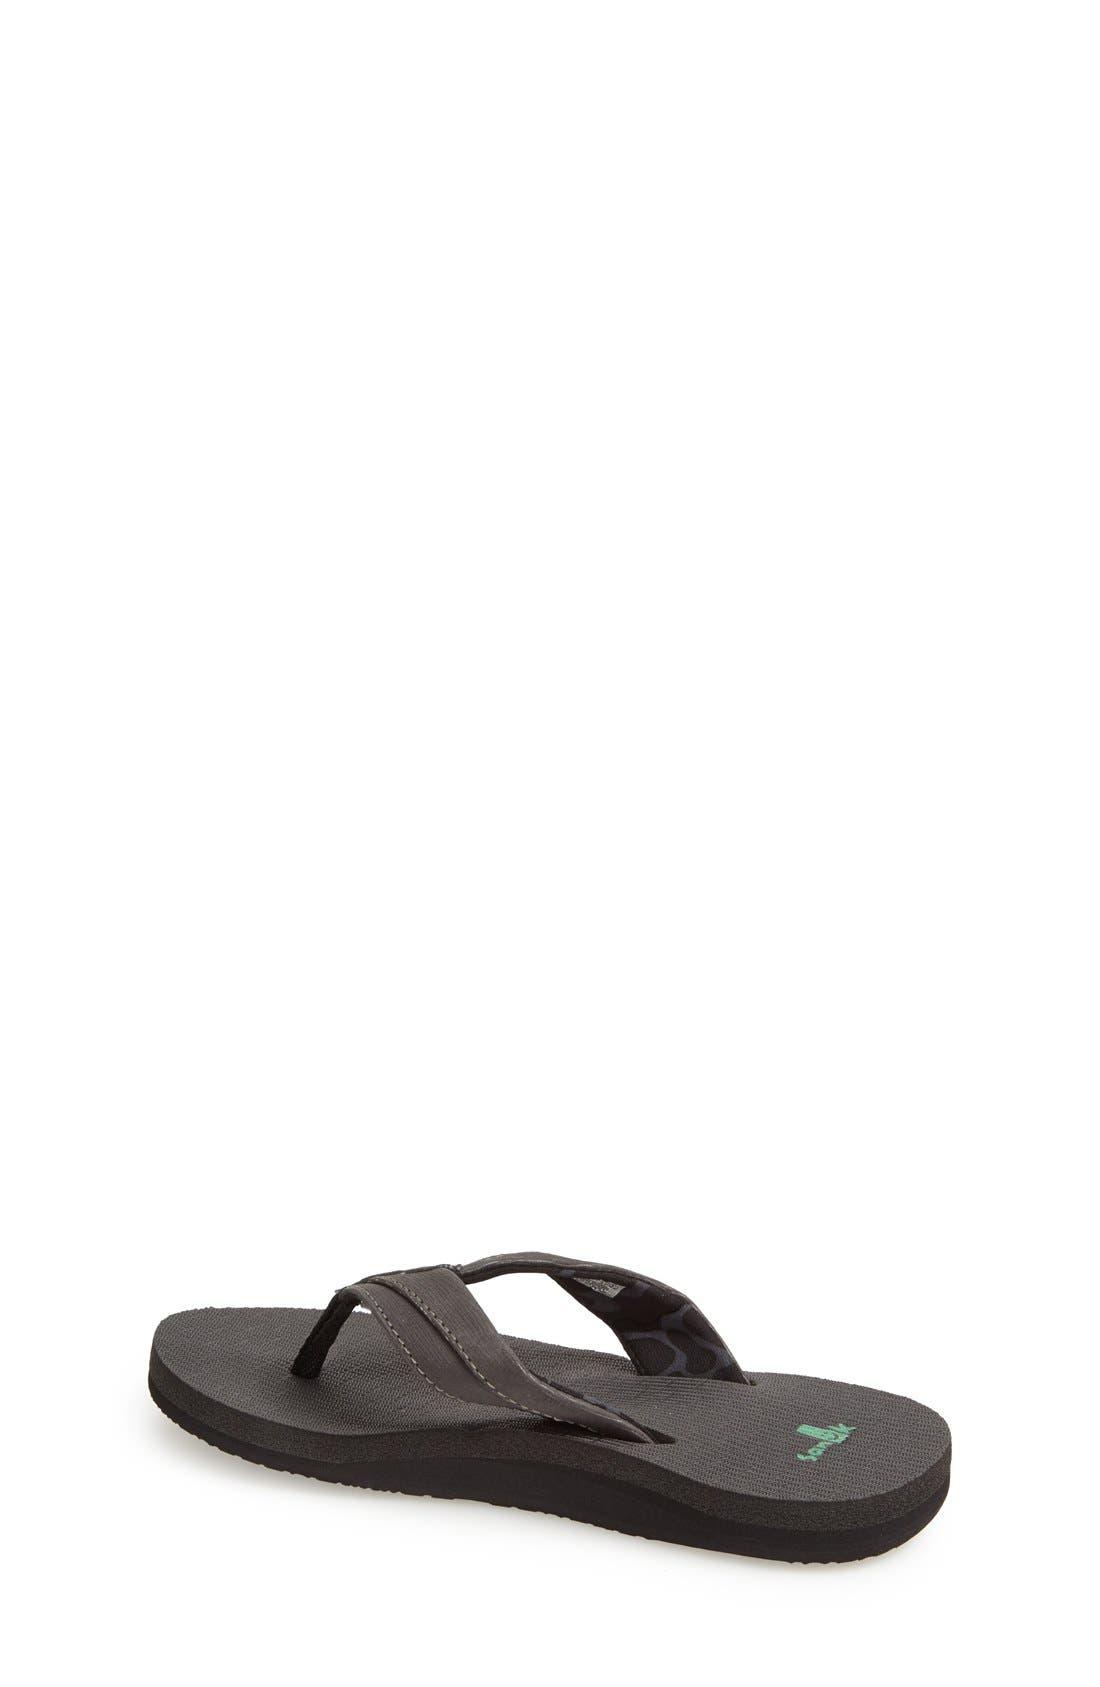 'Rootbeer Cozy' Lightweight Flip Flop Sandal,                             Alternate thumbnail 2, color,                             Black